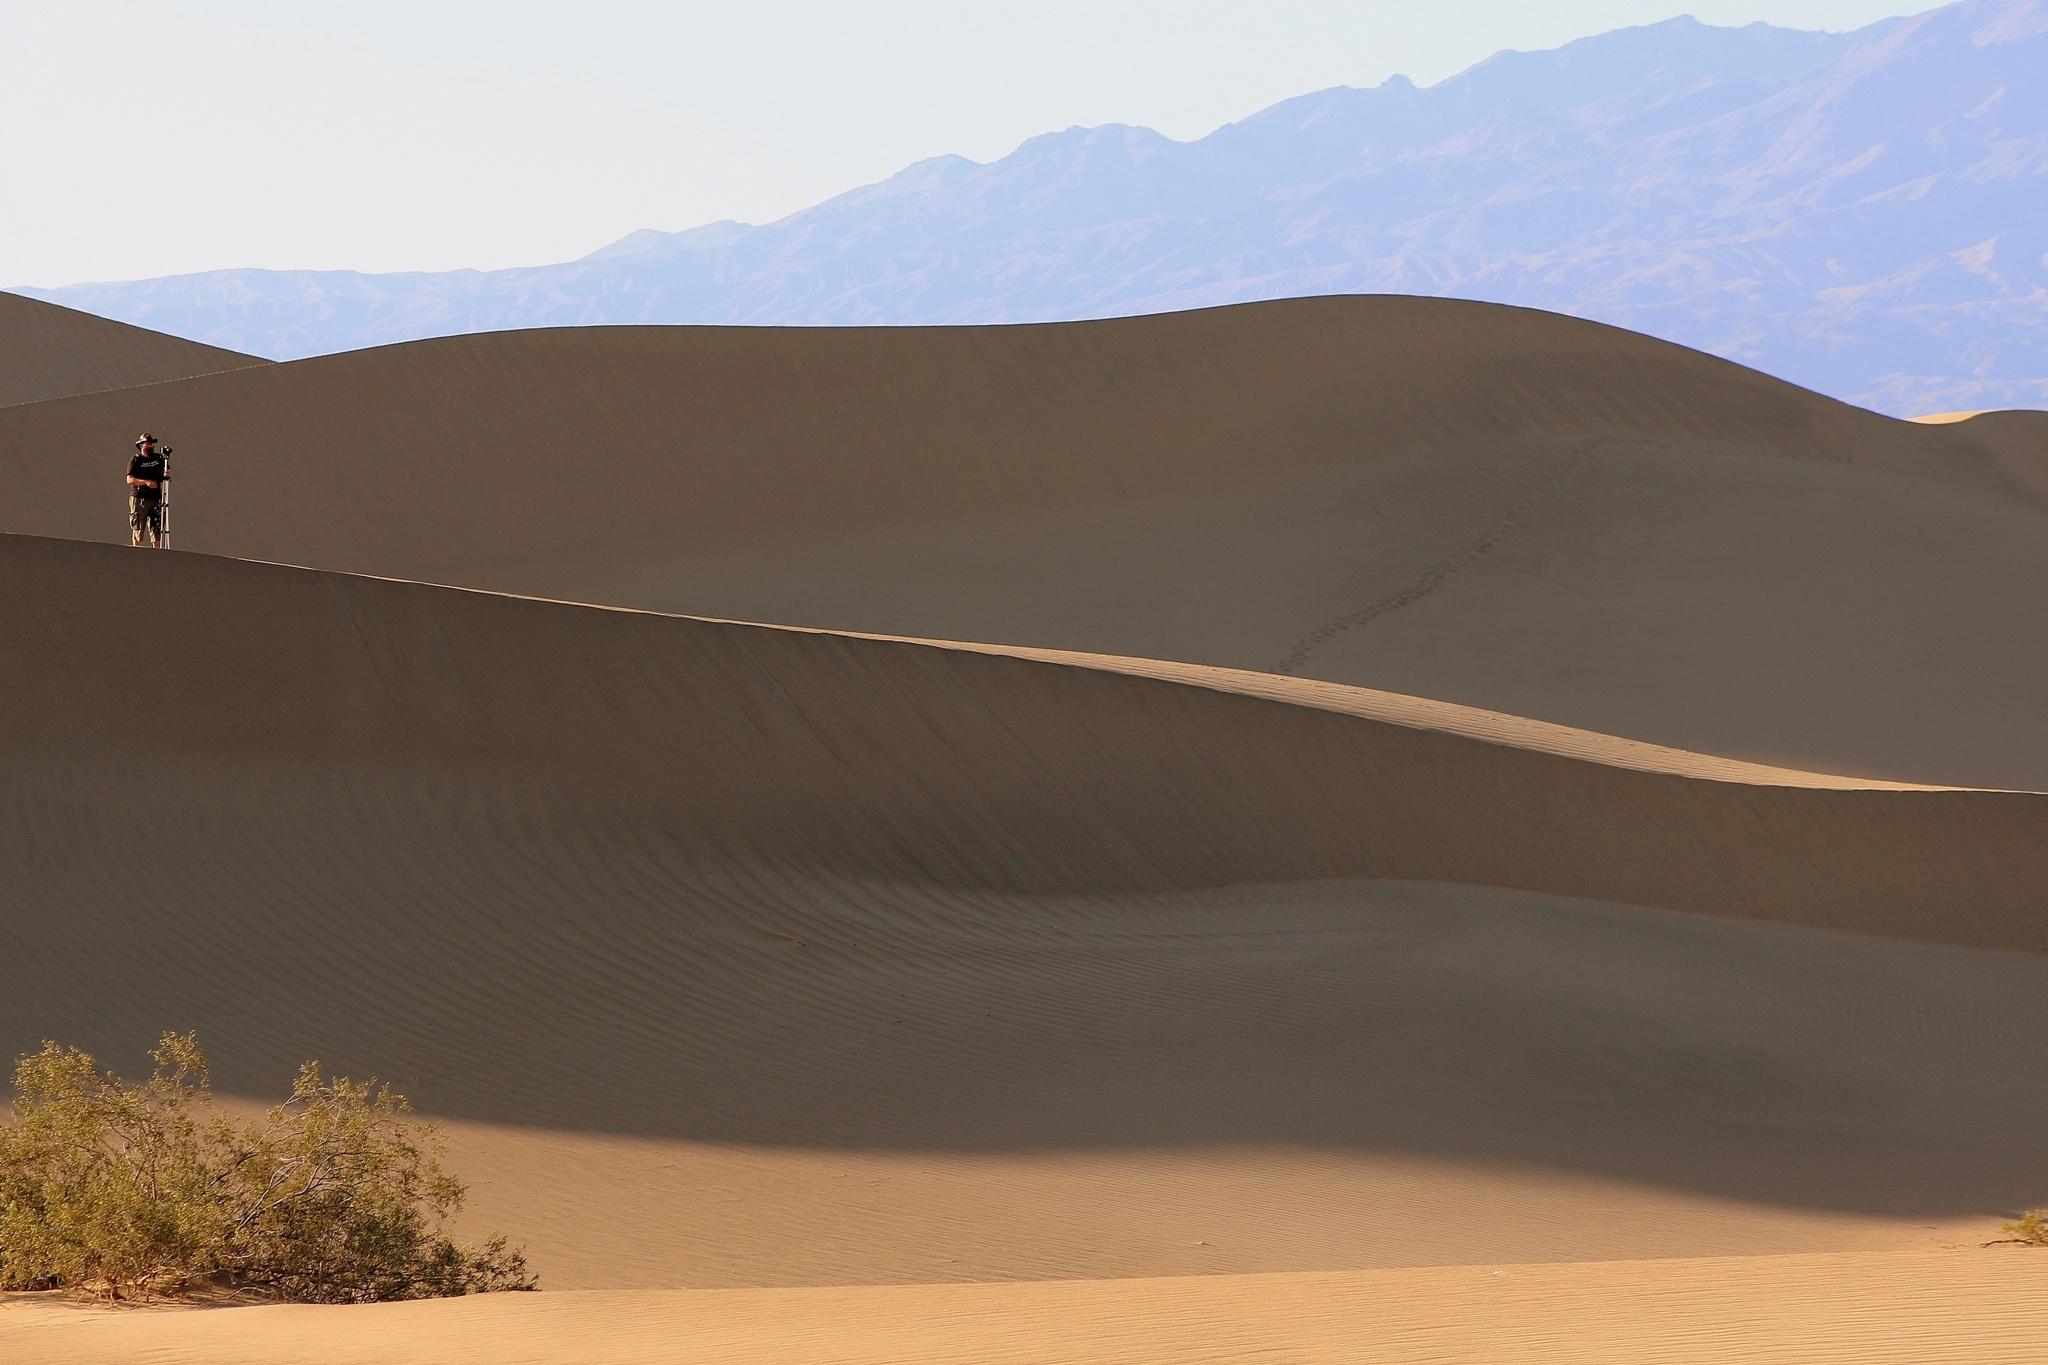 Mesquite flat sand dunes, Death Valley National Park by katze